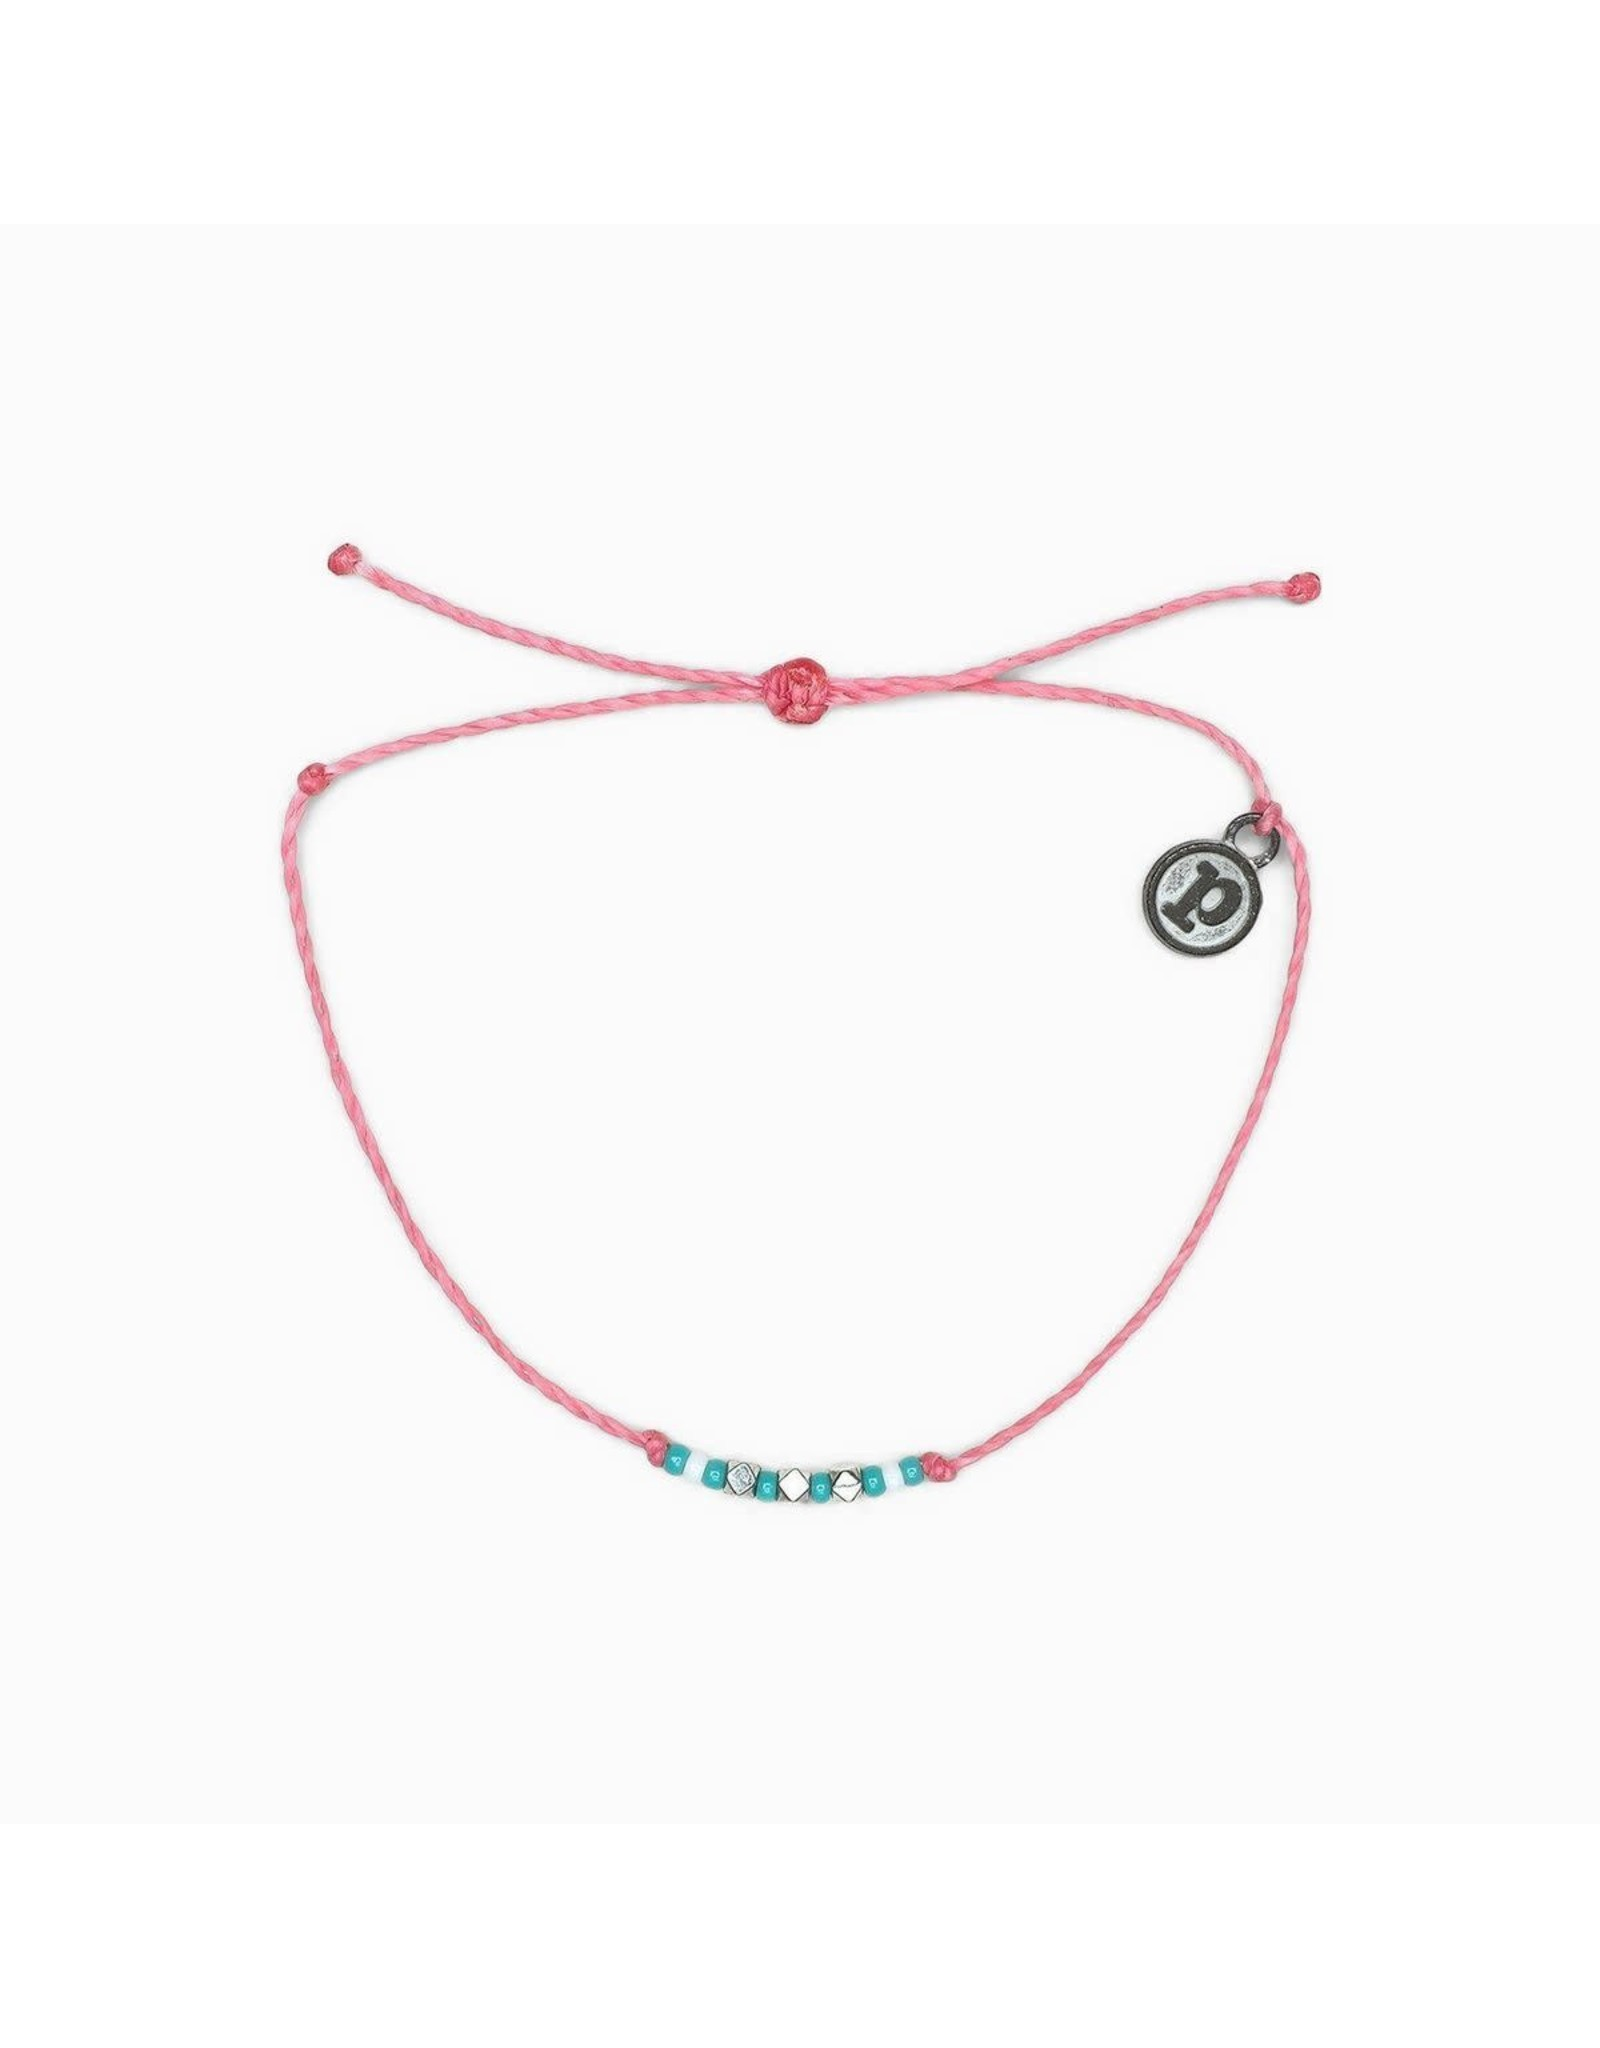 Pura Vida, Silver  Delicate Seed Bead Bracelet, Pink